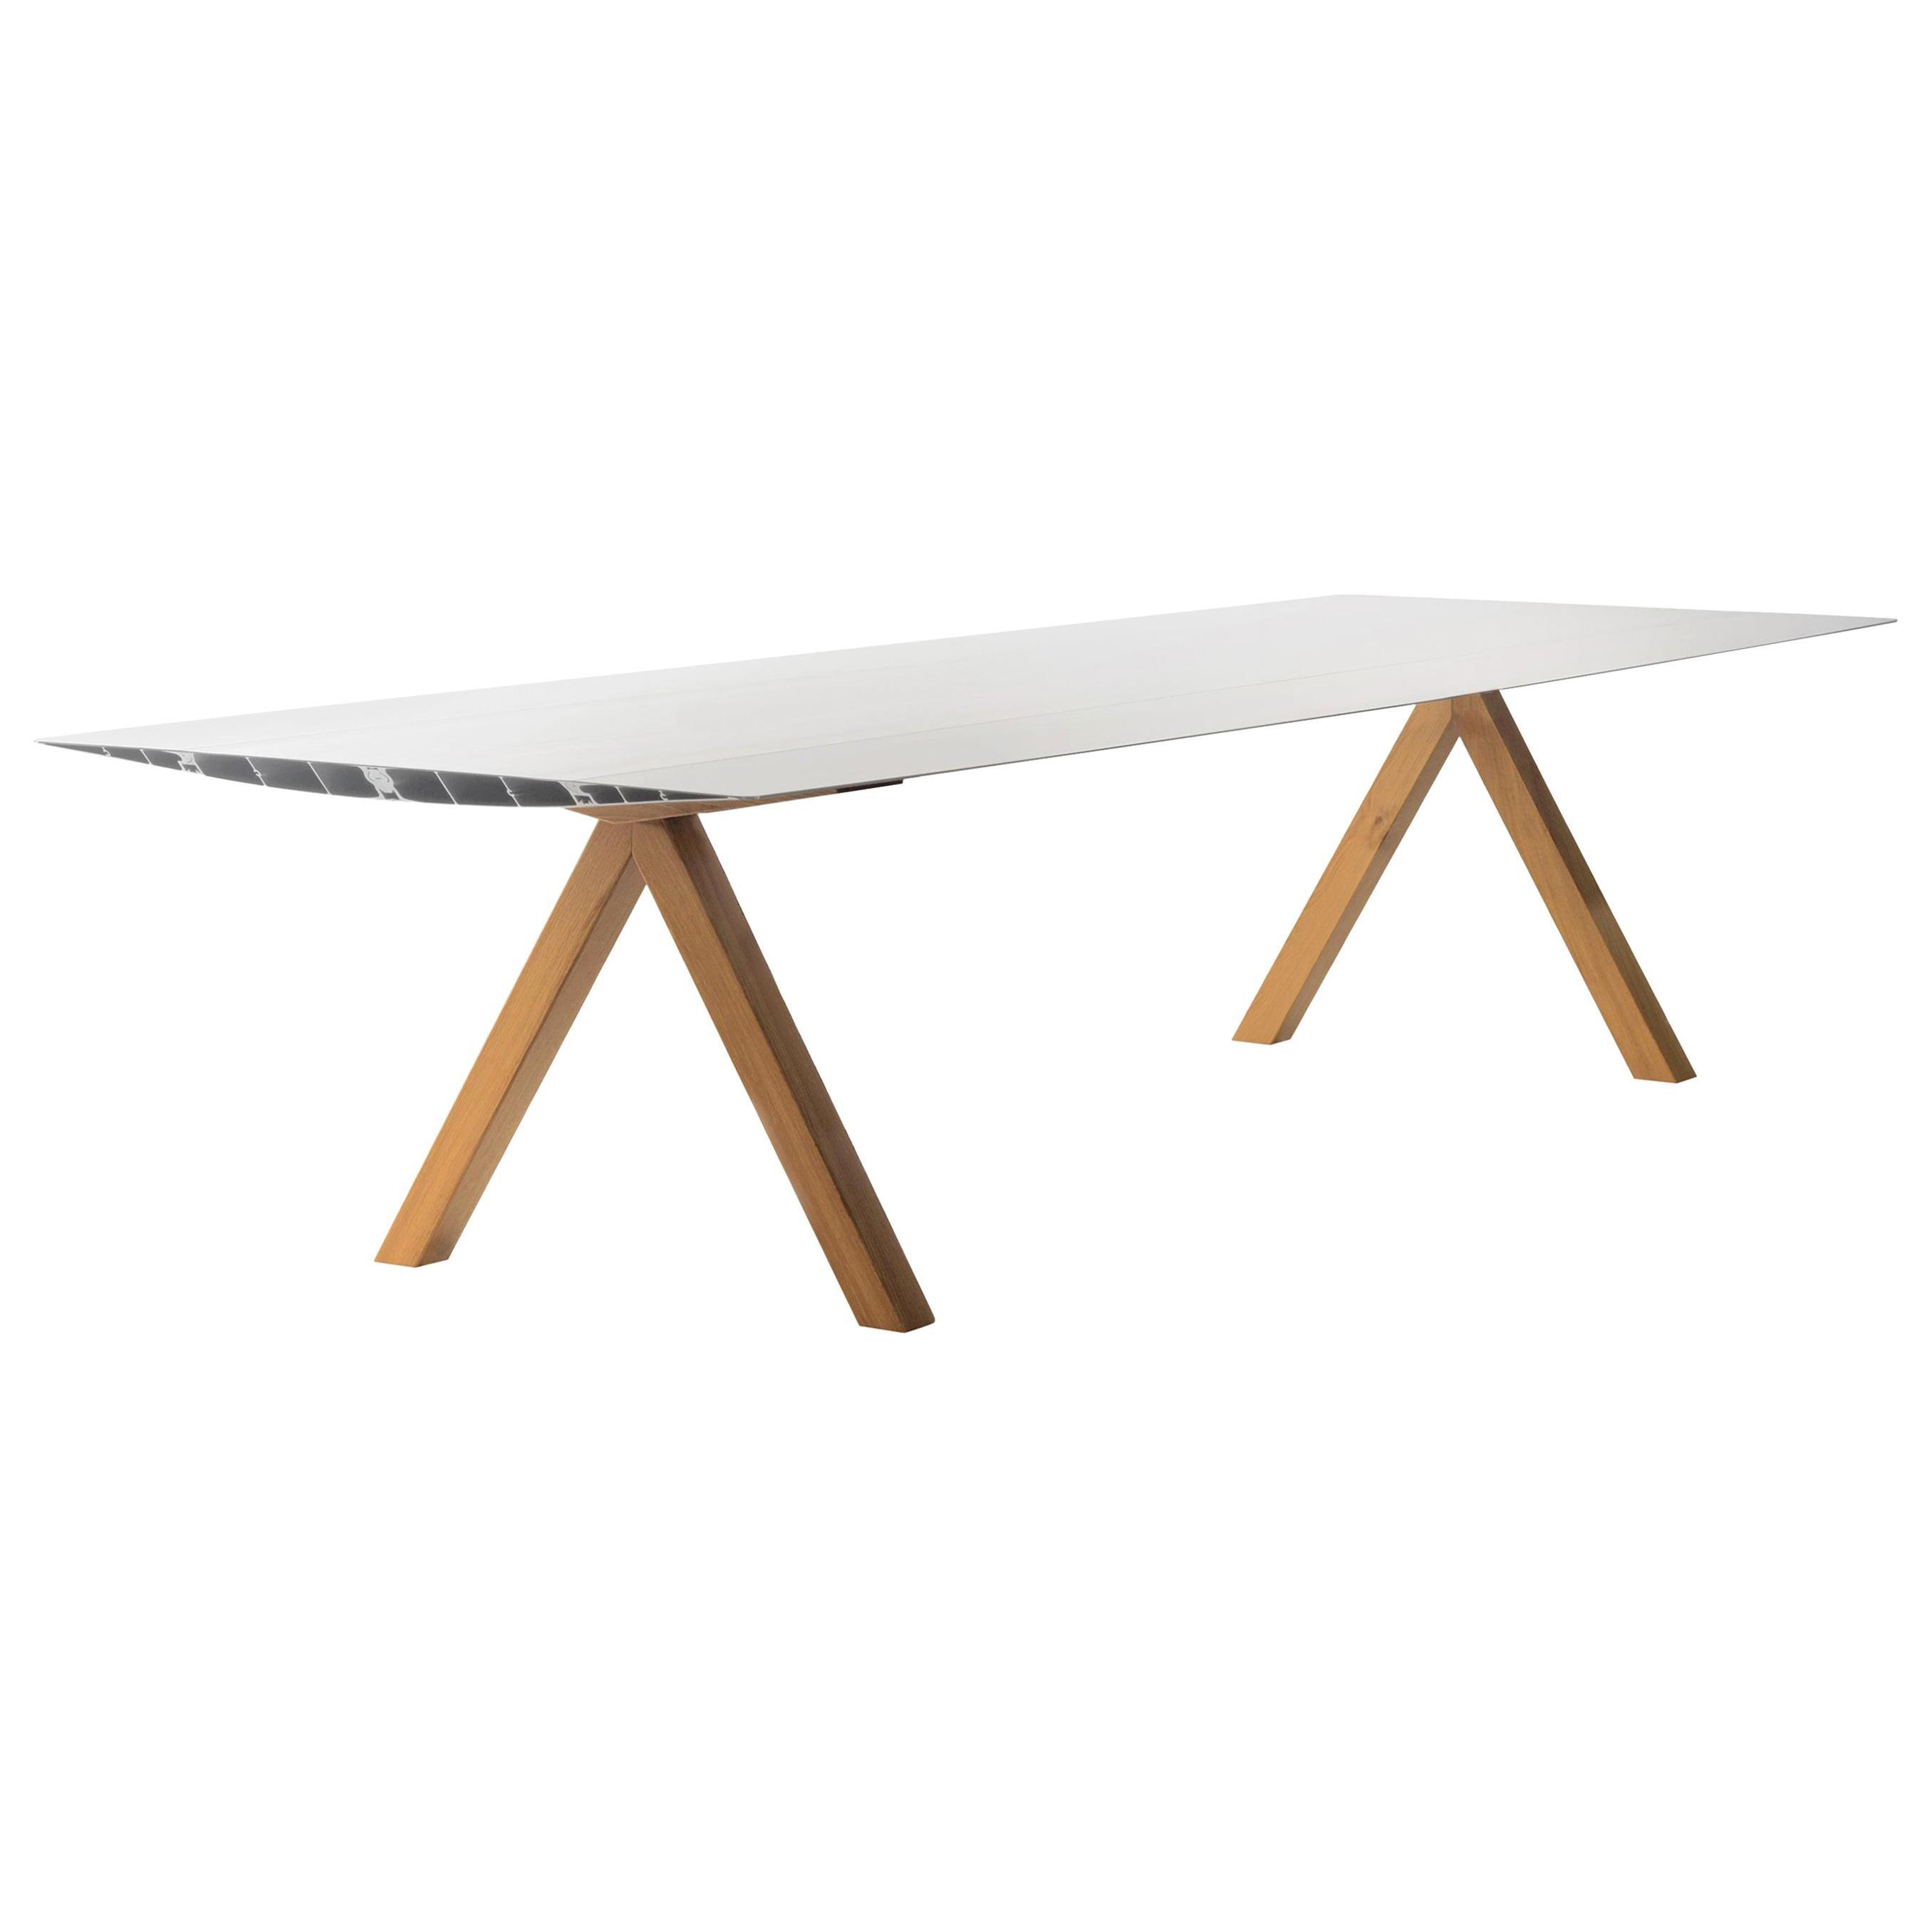 Konstantin Grcic Table 'B' Aluminium by BD Barcelona